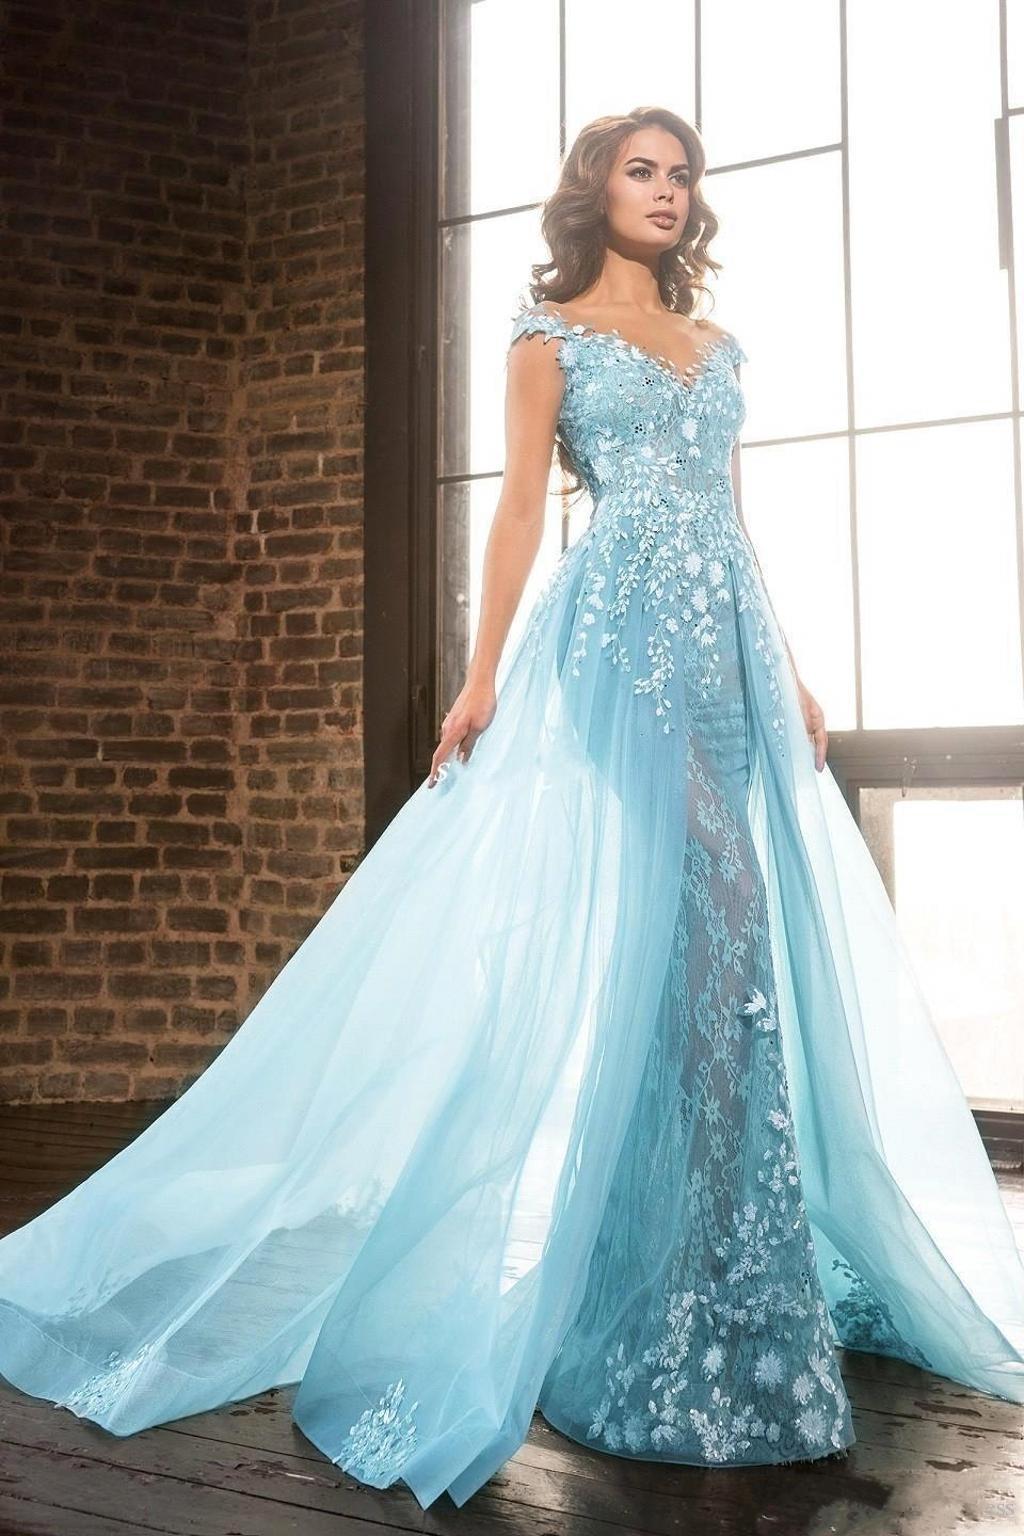 2019 New Luxury Light Blue Sheer Jewel Neck Vestidos de noche A-Line Encaje Apliques Beads Overskirts Vestidos de noche Vestidos de fiesta